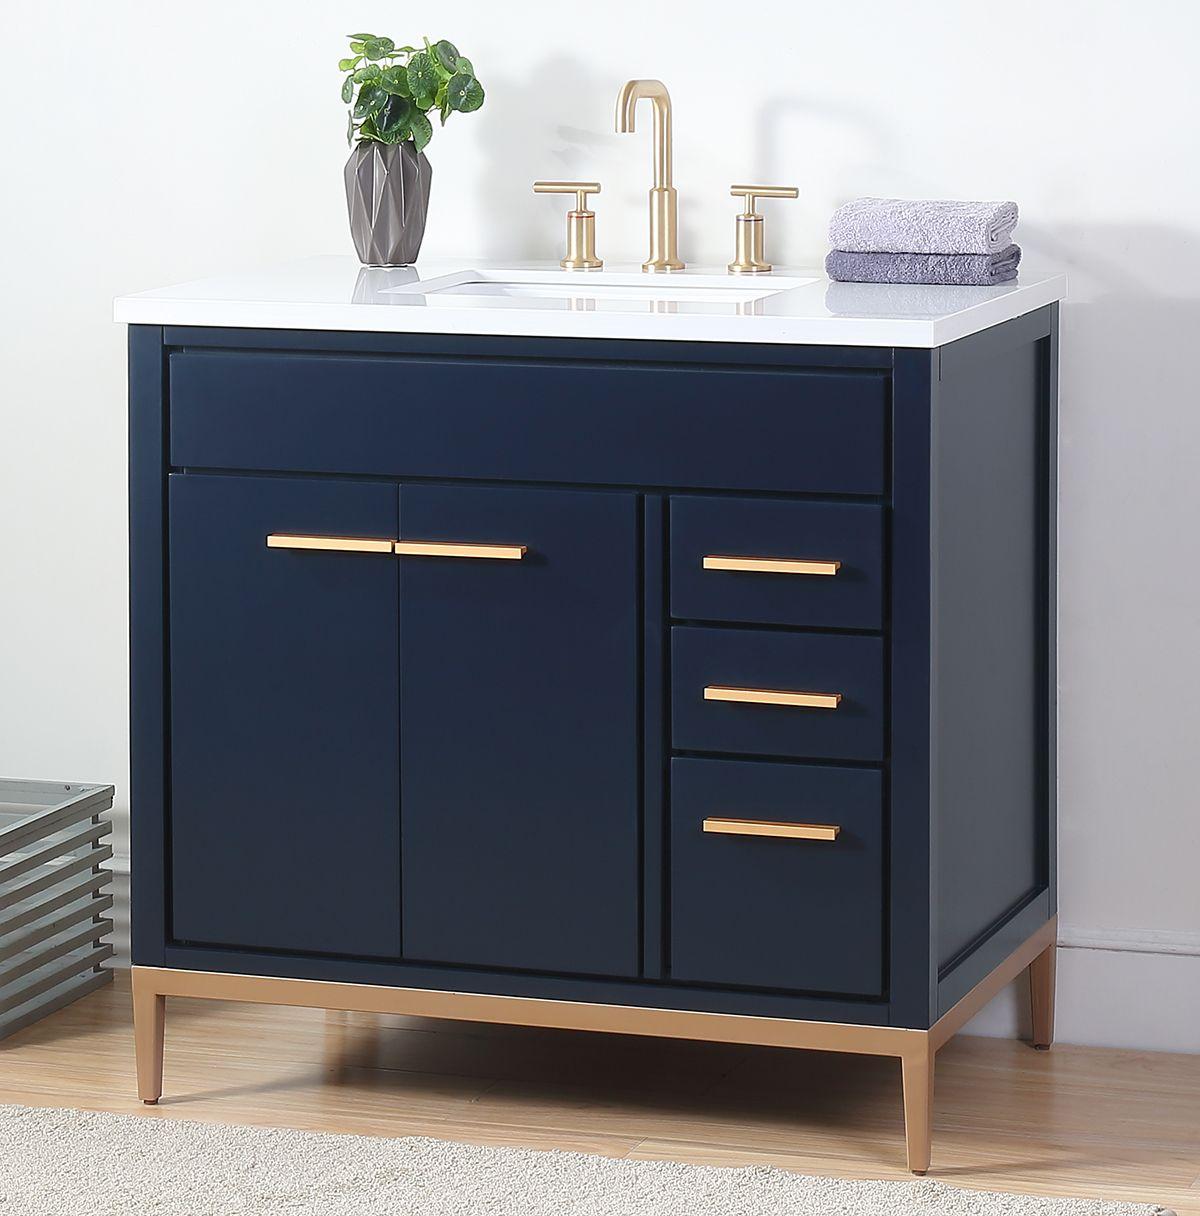 36 Tennant Brand Beatrice Navy Blue Modern Bathroom Sink Vanity Tb 9888nb V36 With Images Bathroom Sink Vanity Blue Bathroom Vanity Modern Bathroom Sink